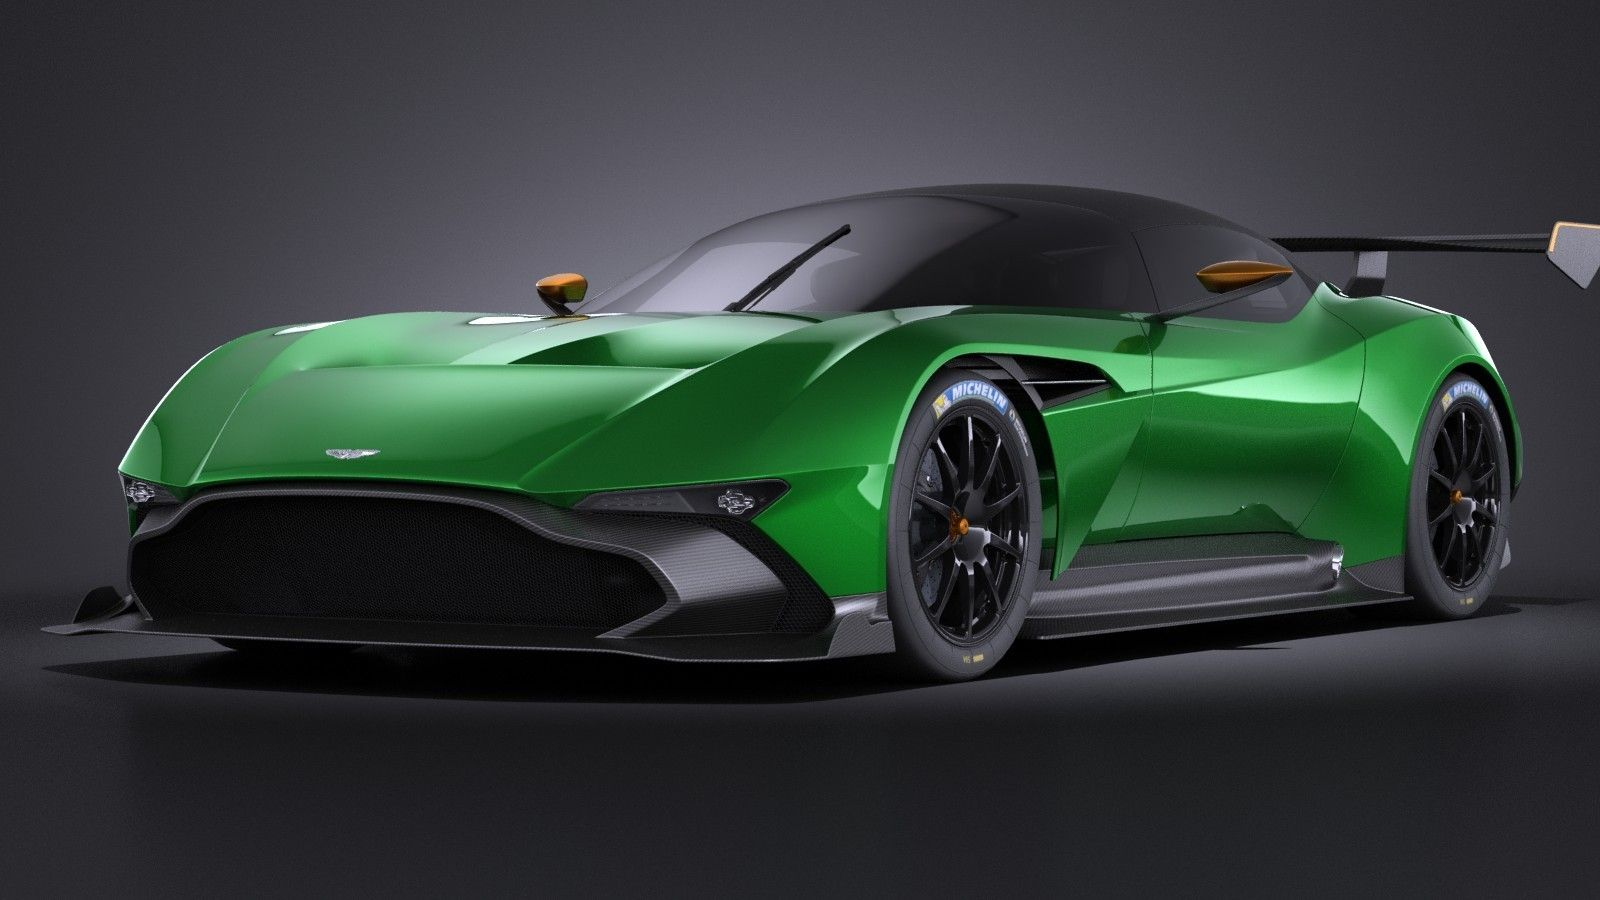 Aston Martin Vulcan 2016 Vray In 2020 Aston Martin Vulcan Aston Martin Vulcan